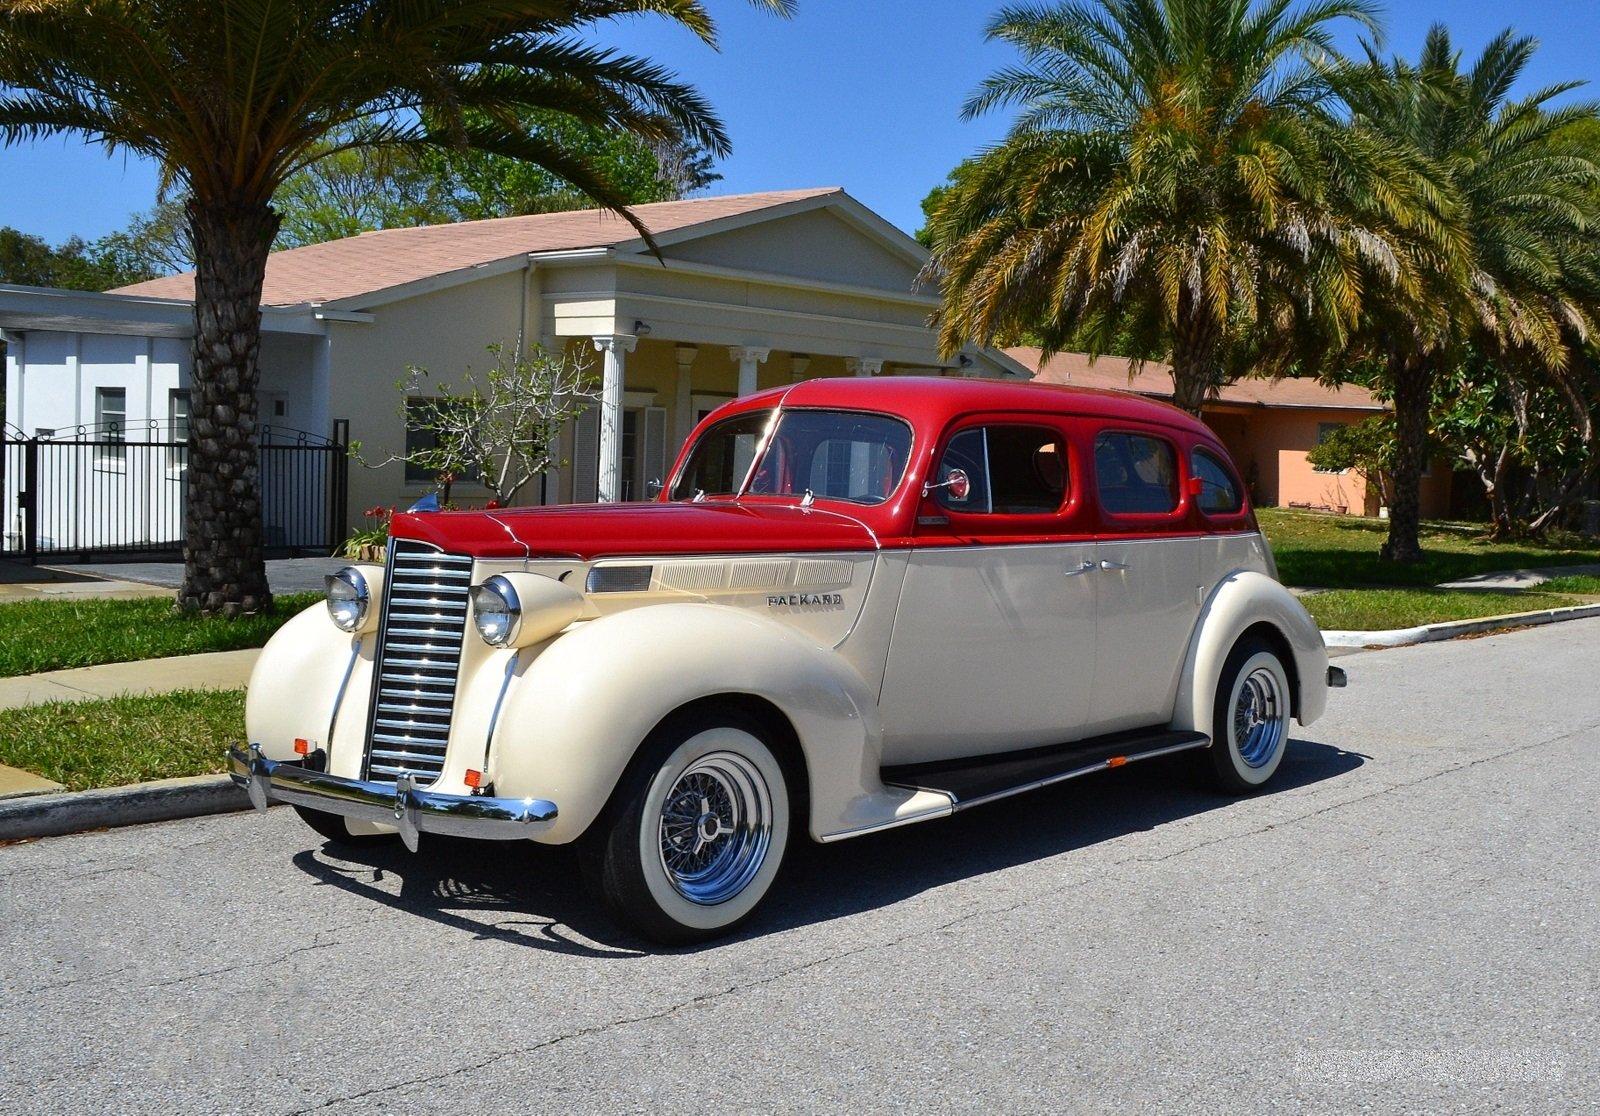 1938 packard street rod sedan